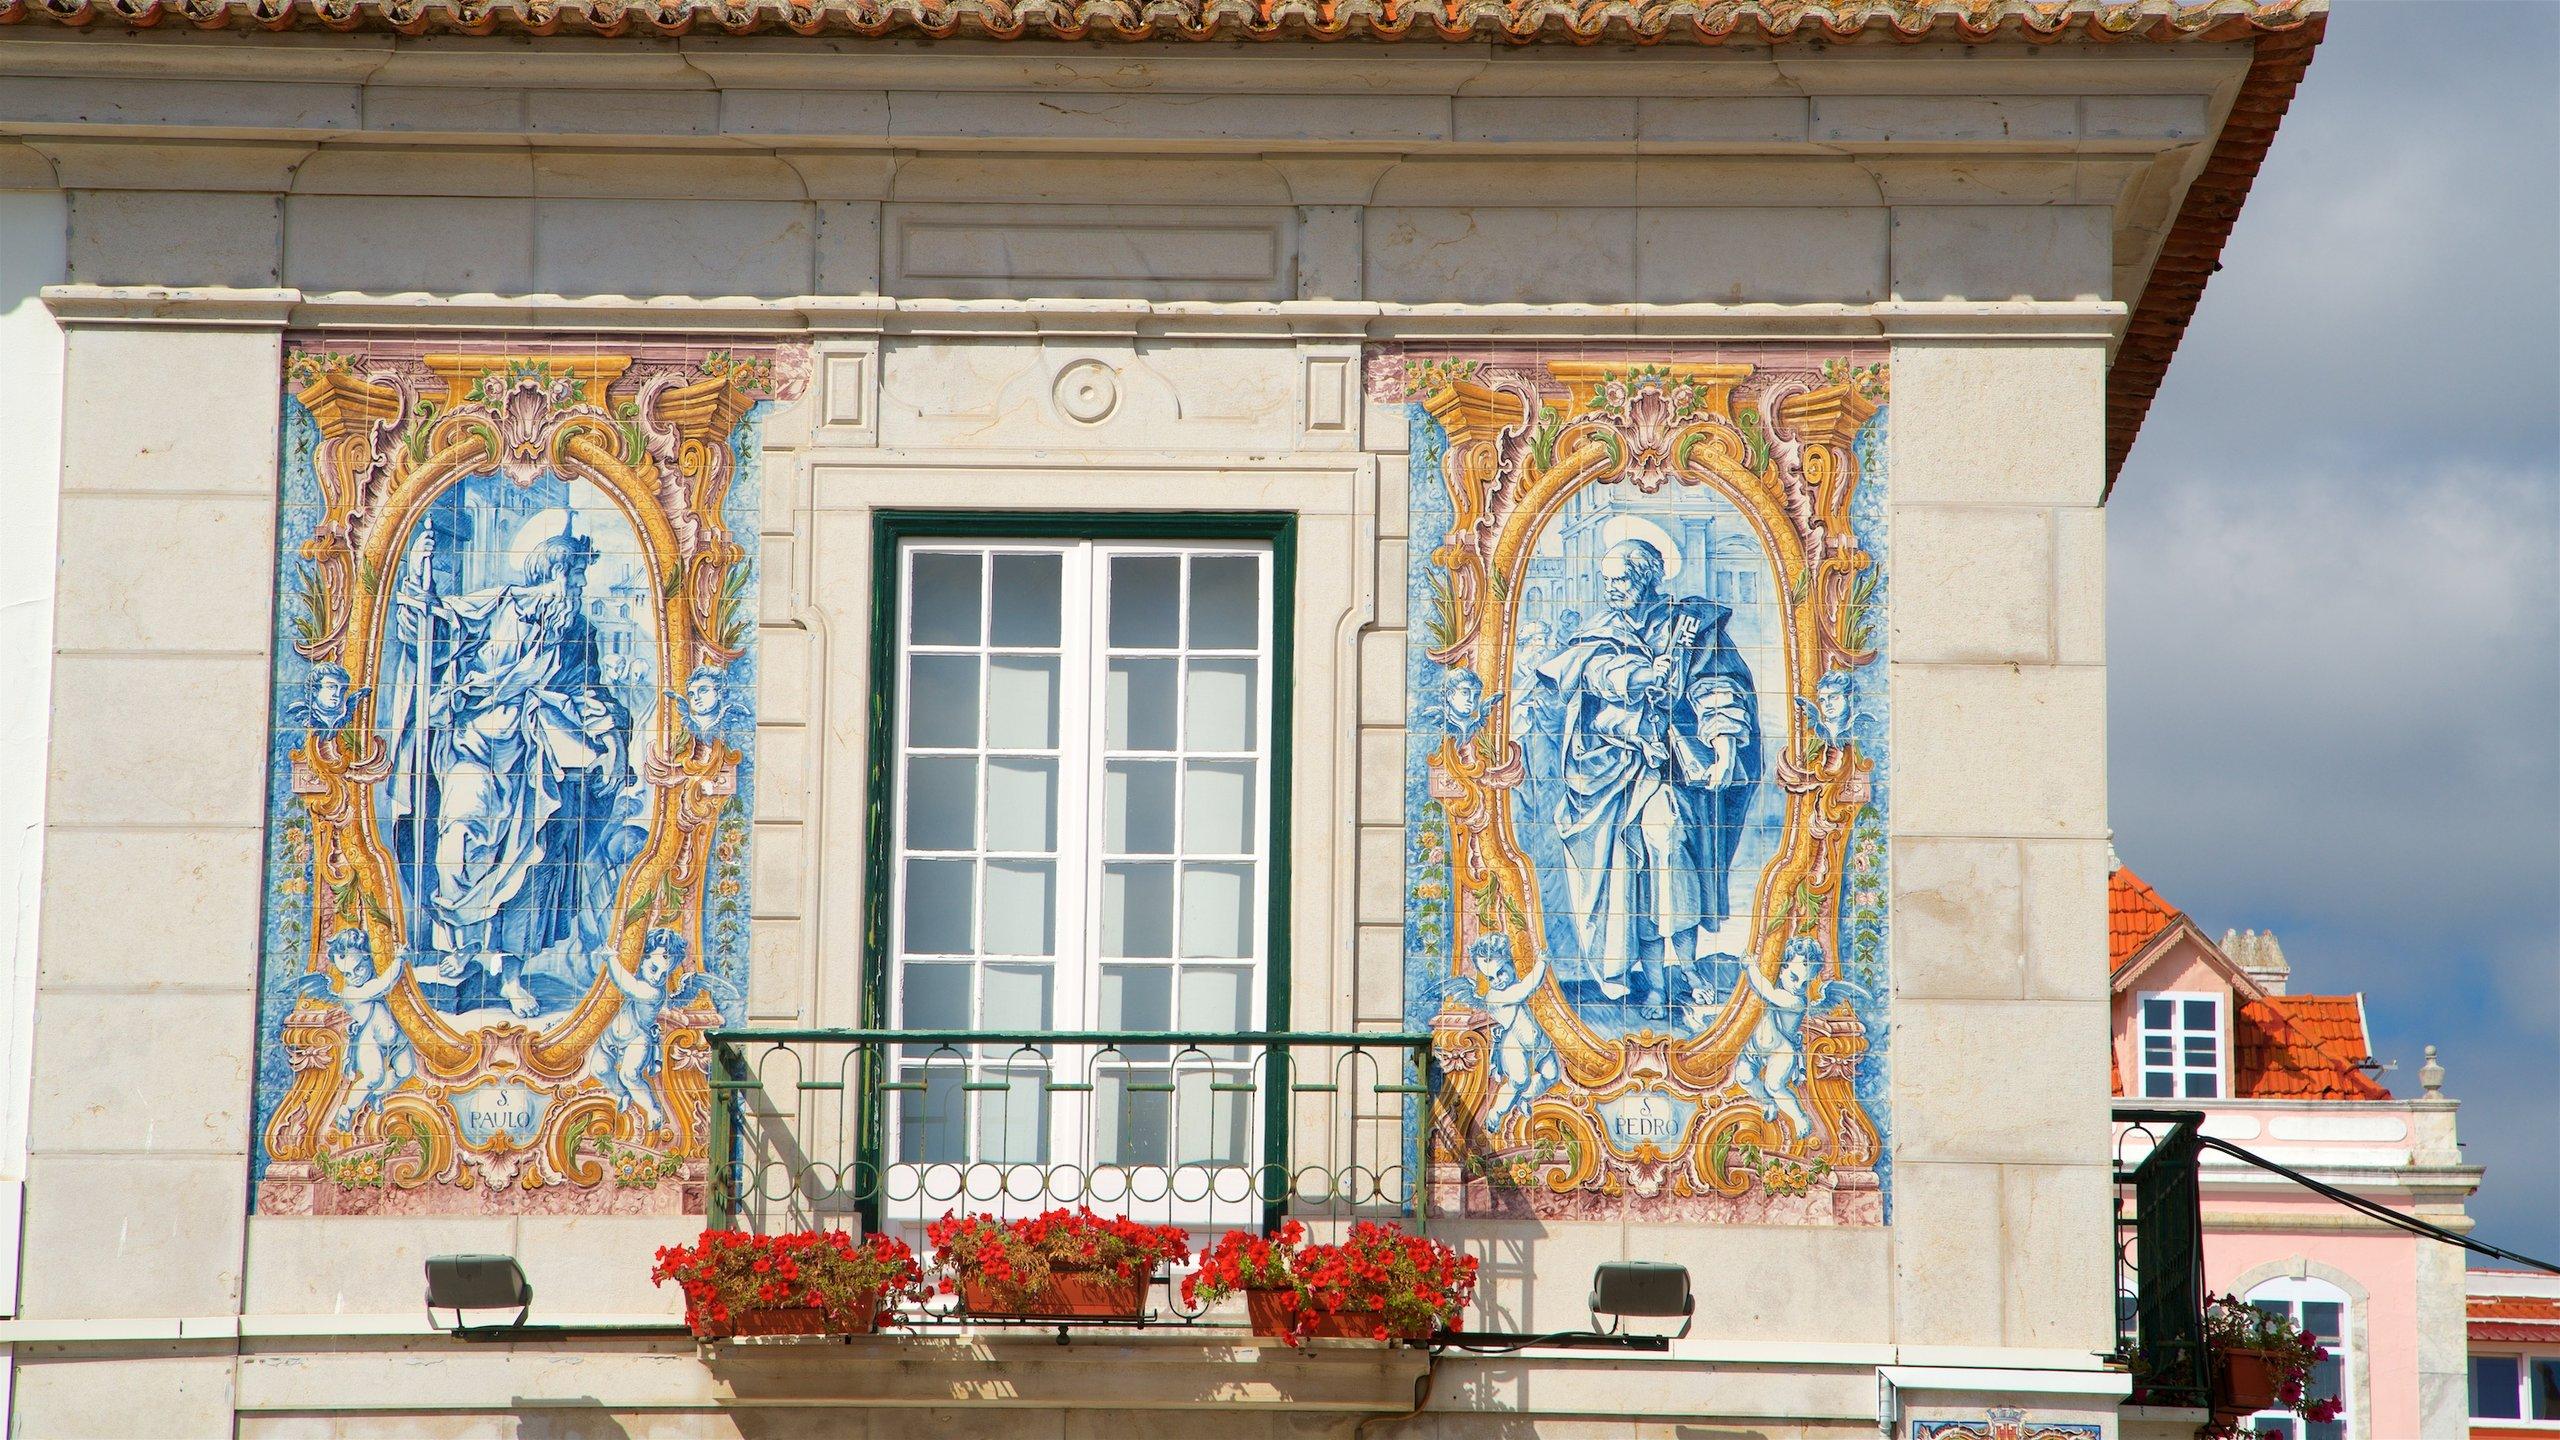 Banzão, Sintra, Lisbon District, Portugal